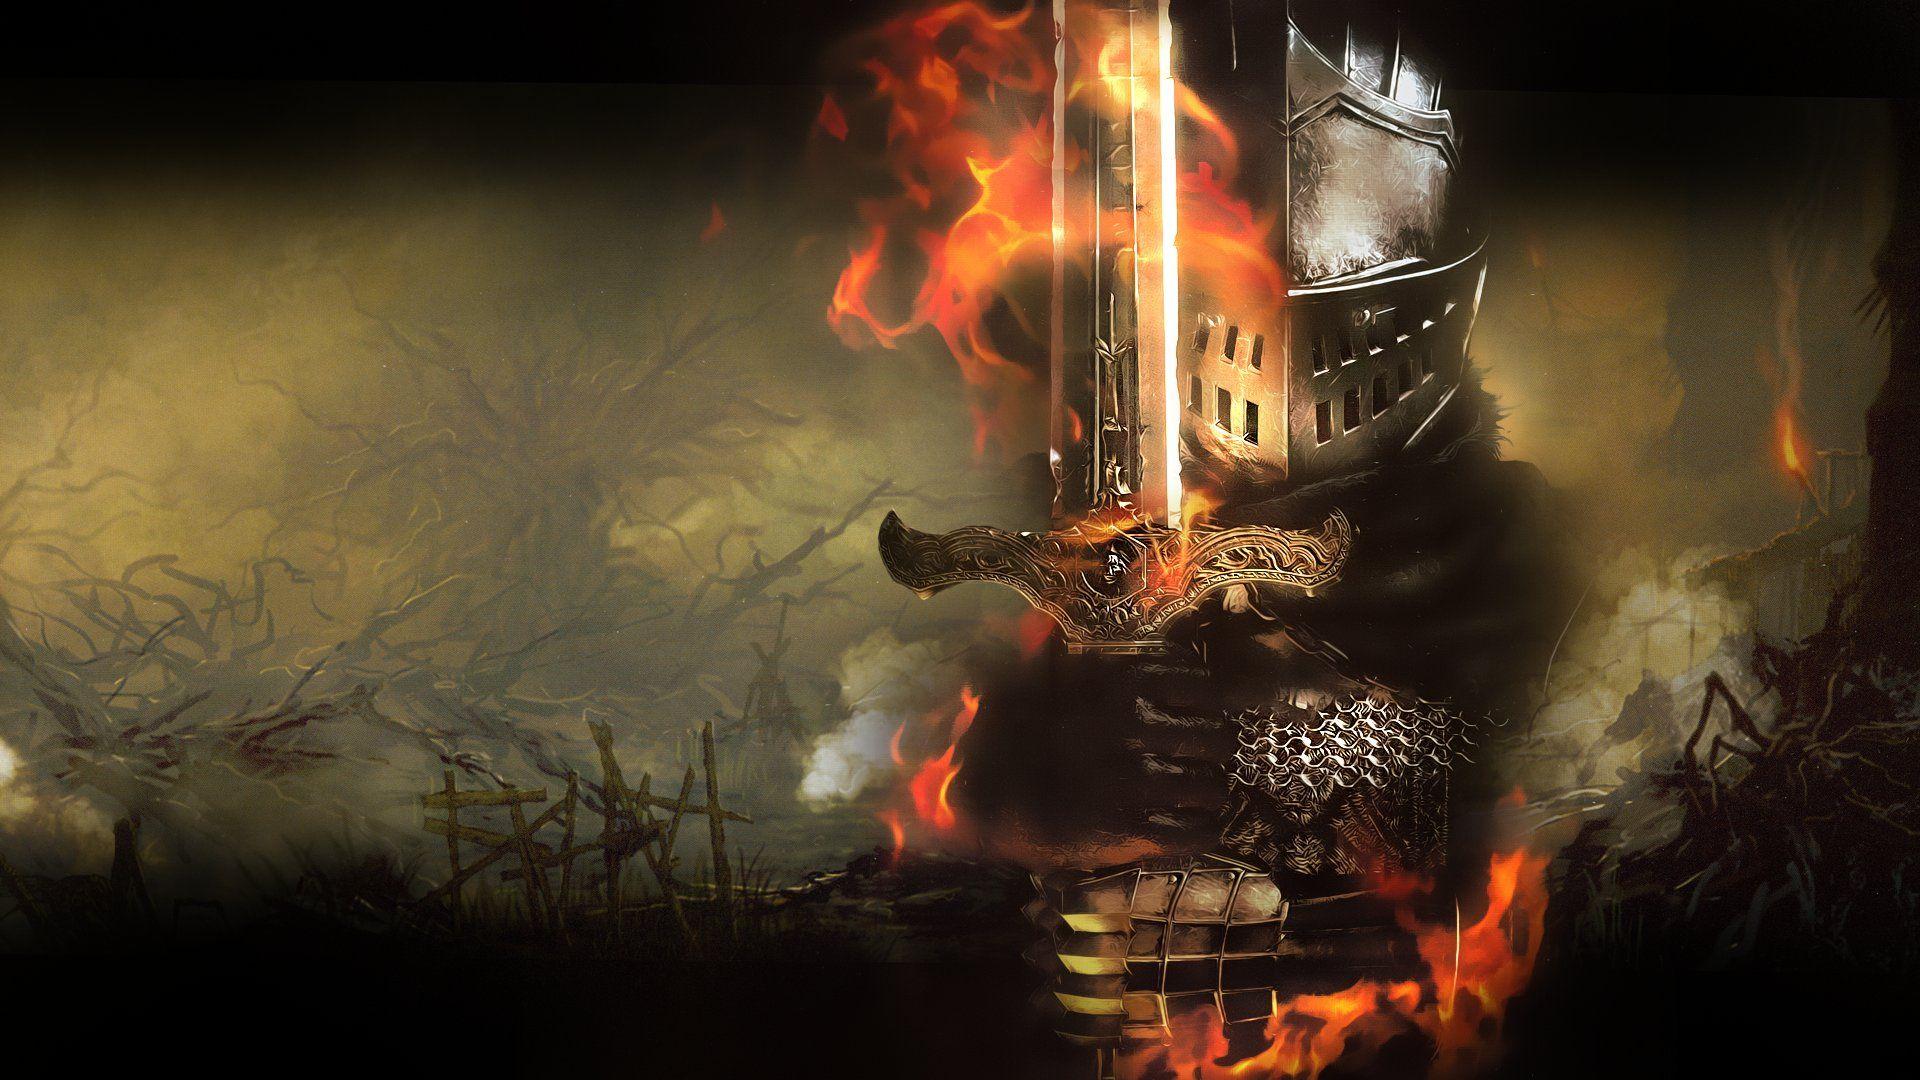 Dark Souls Wallpaper 1080p Is Cool Wallpapers Dark Souls Game Wallpapers Dark Souls Wallpaper Dark Souls